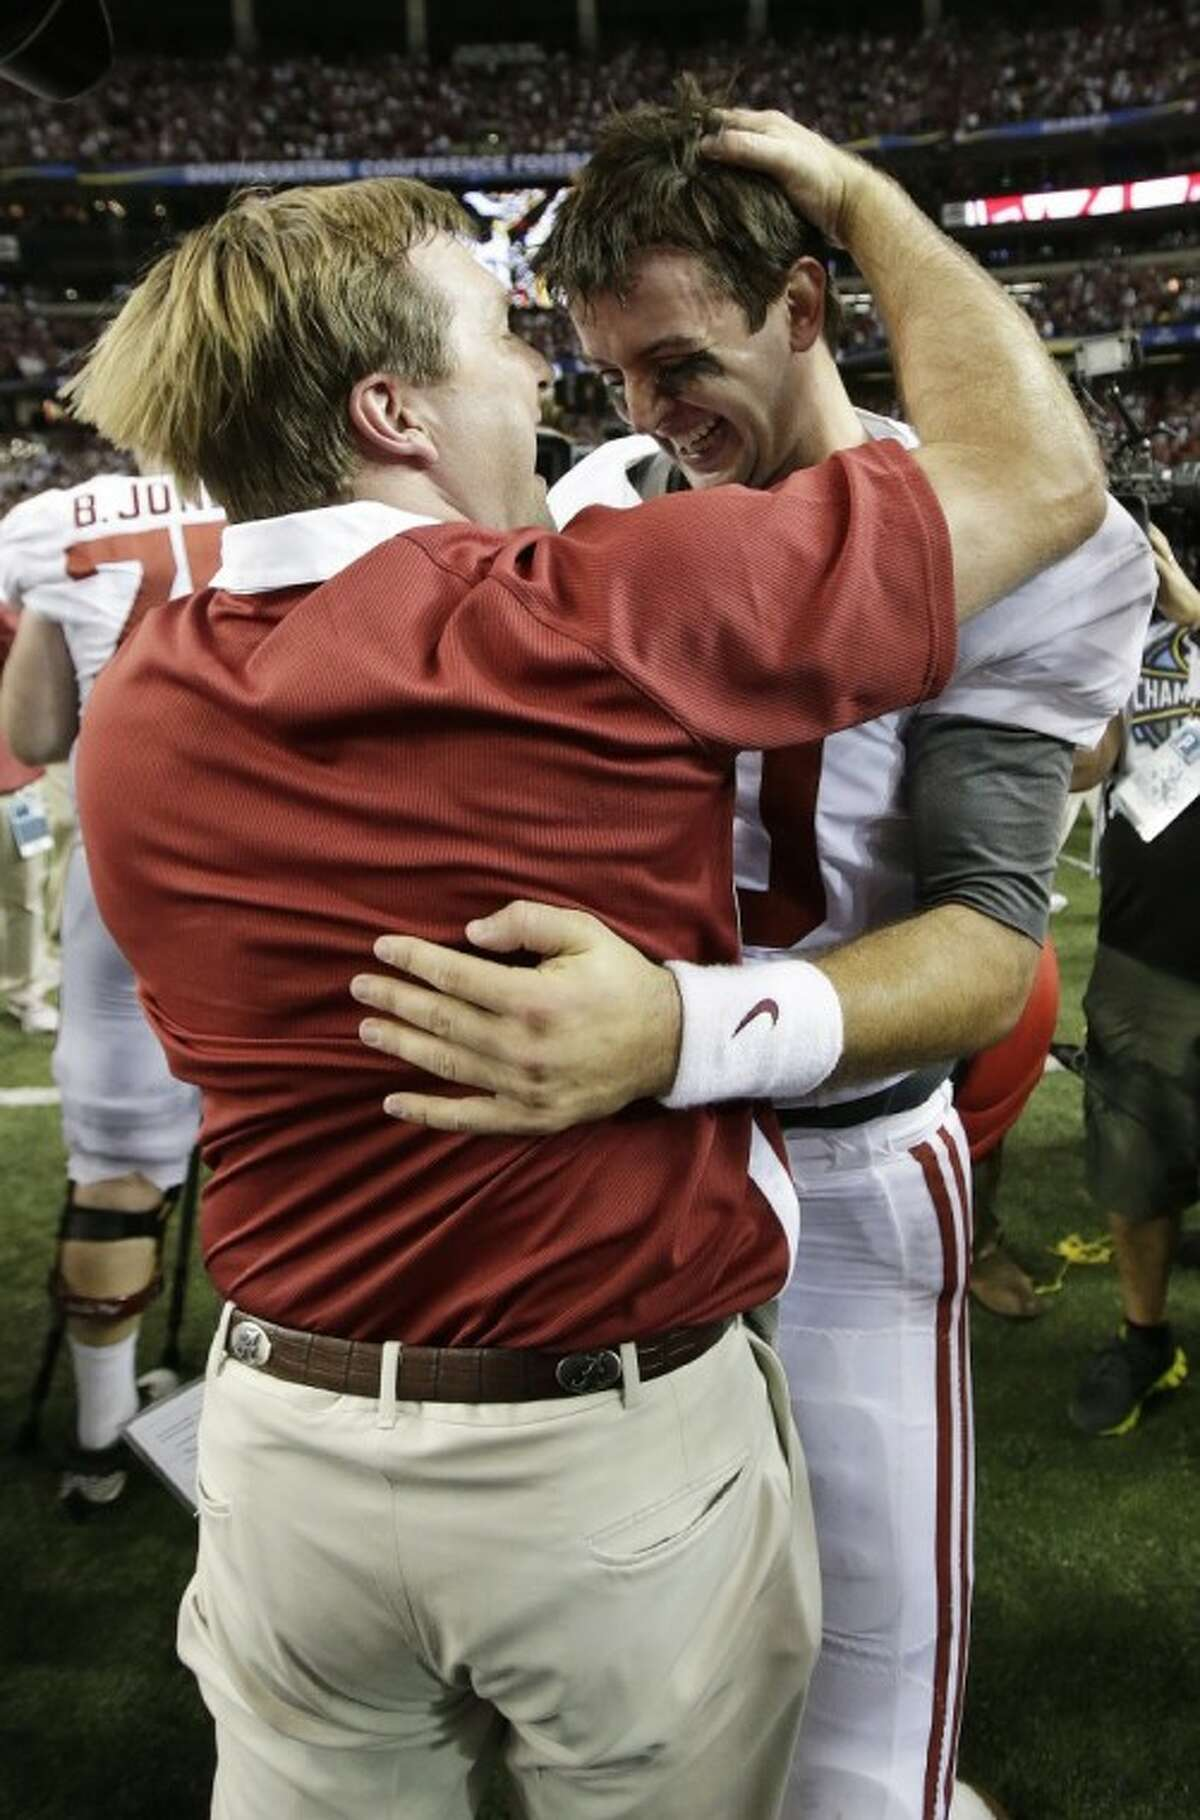 Alabama defensive coordinator Kirby Smart embraces quarterback AJ McCarron after the Crimson Tide's 32-28 win over Georgia in the SEC title game.